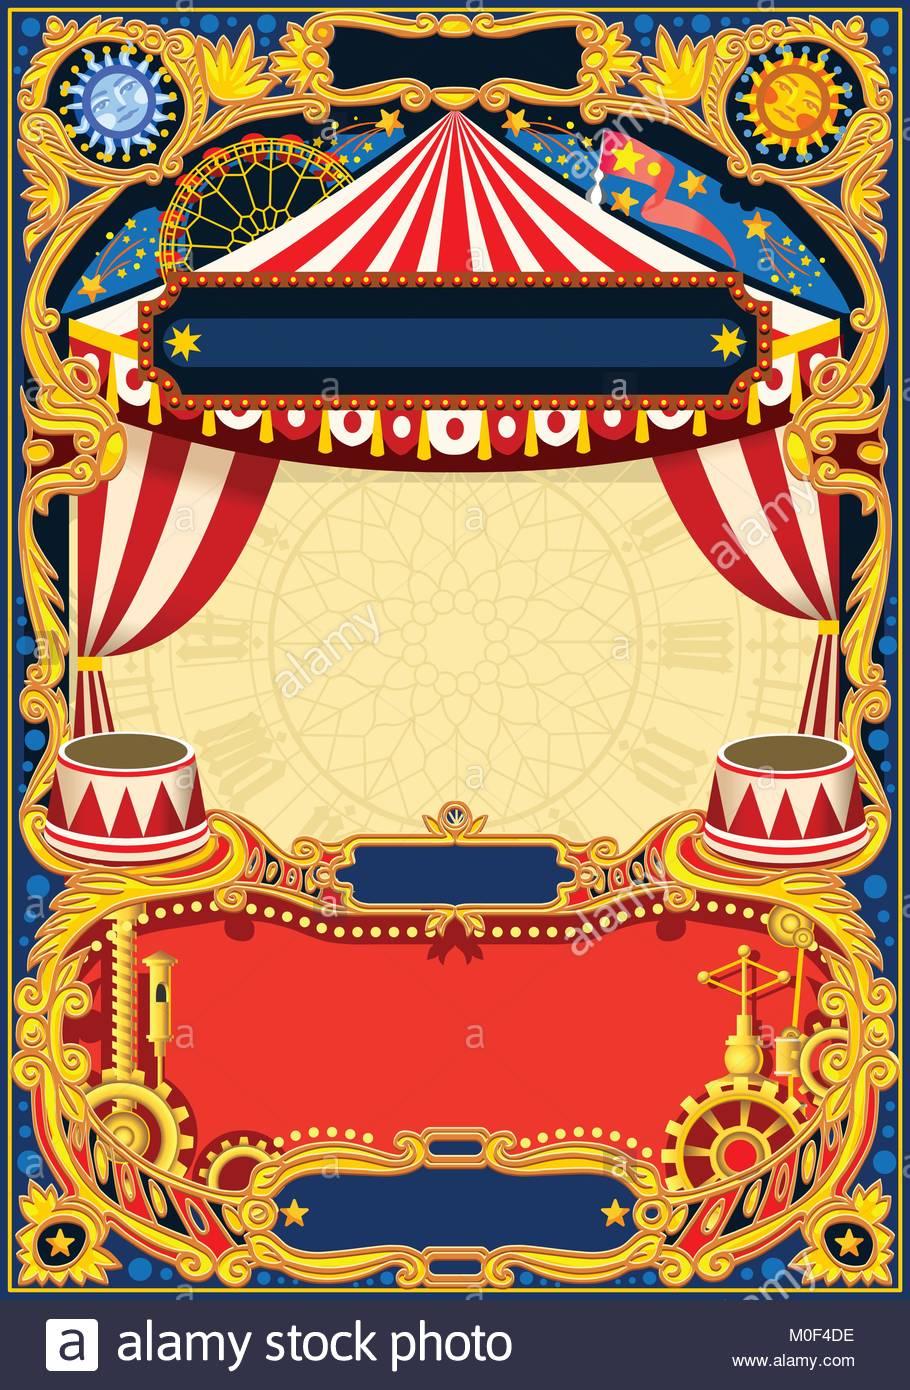 Circo bastidor editable. Vintage plantilla con carpa de circo para ...